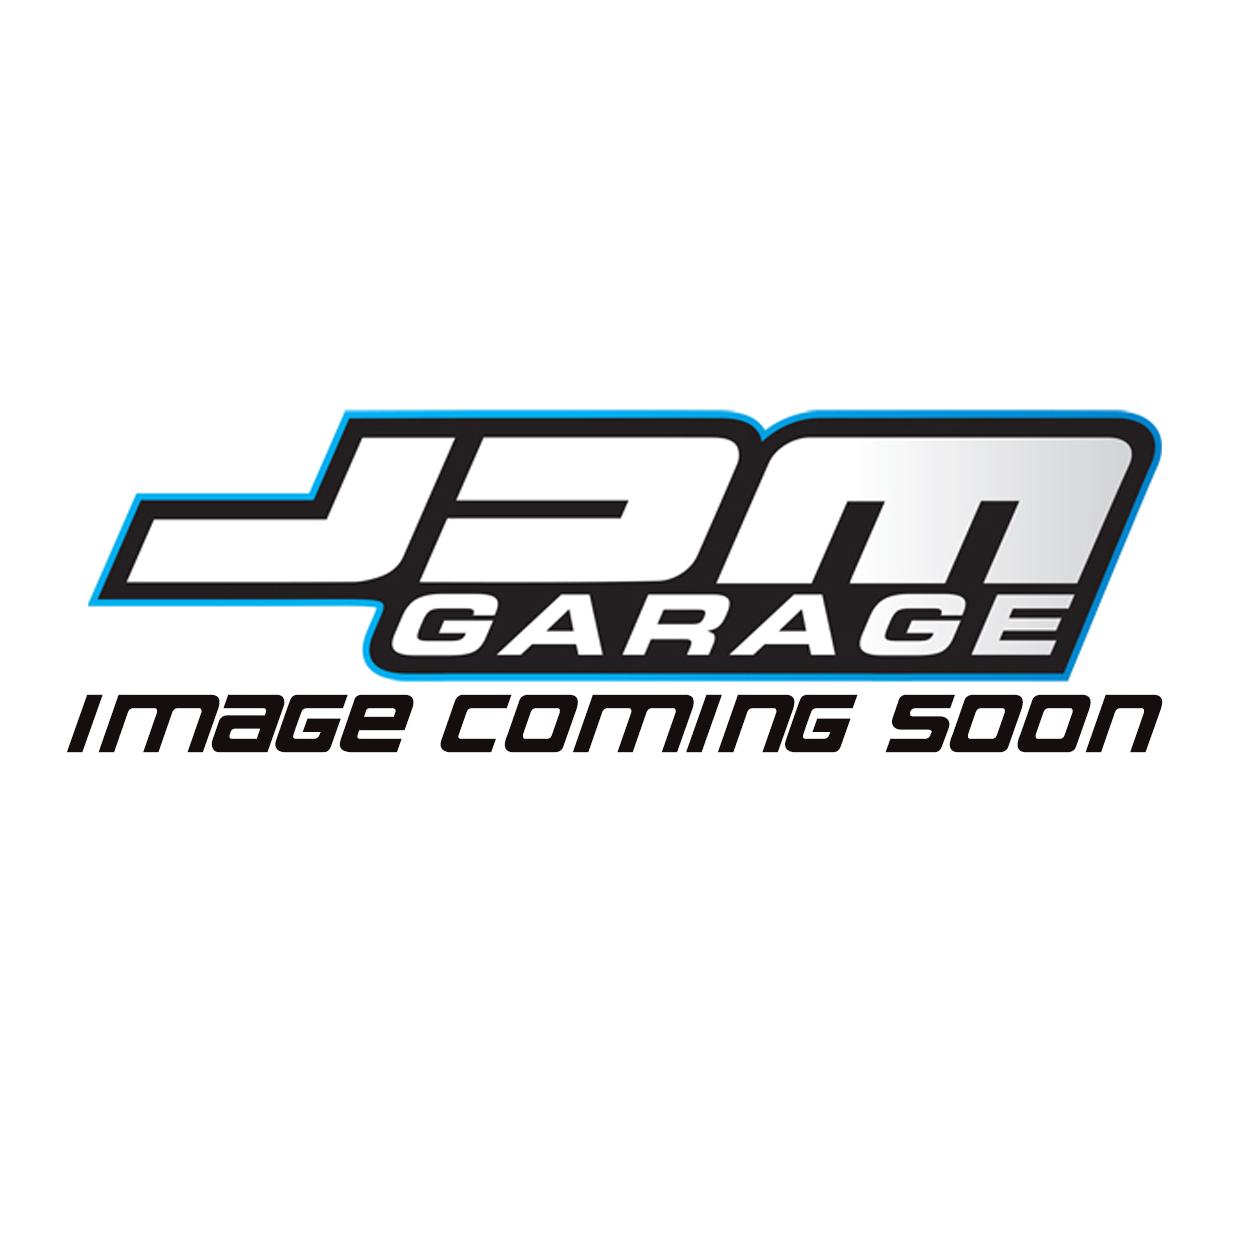 Genuine Nissan Fuel & Brake Line Clip For Nissan Skyline R32 Silvia S14 S15 Cefiro A31 Laurel C33 46289-71L00